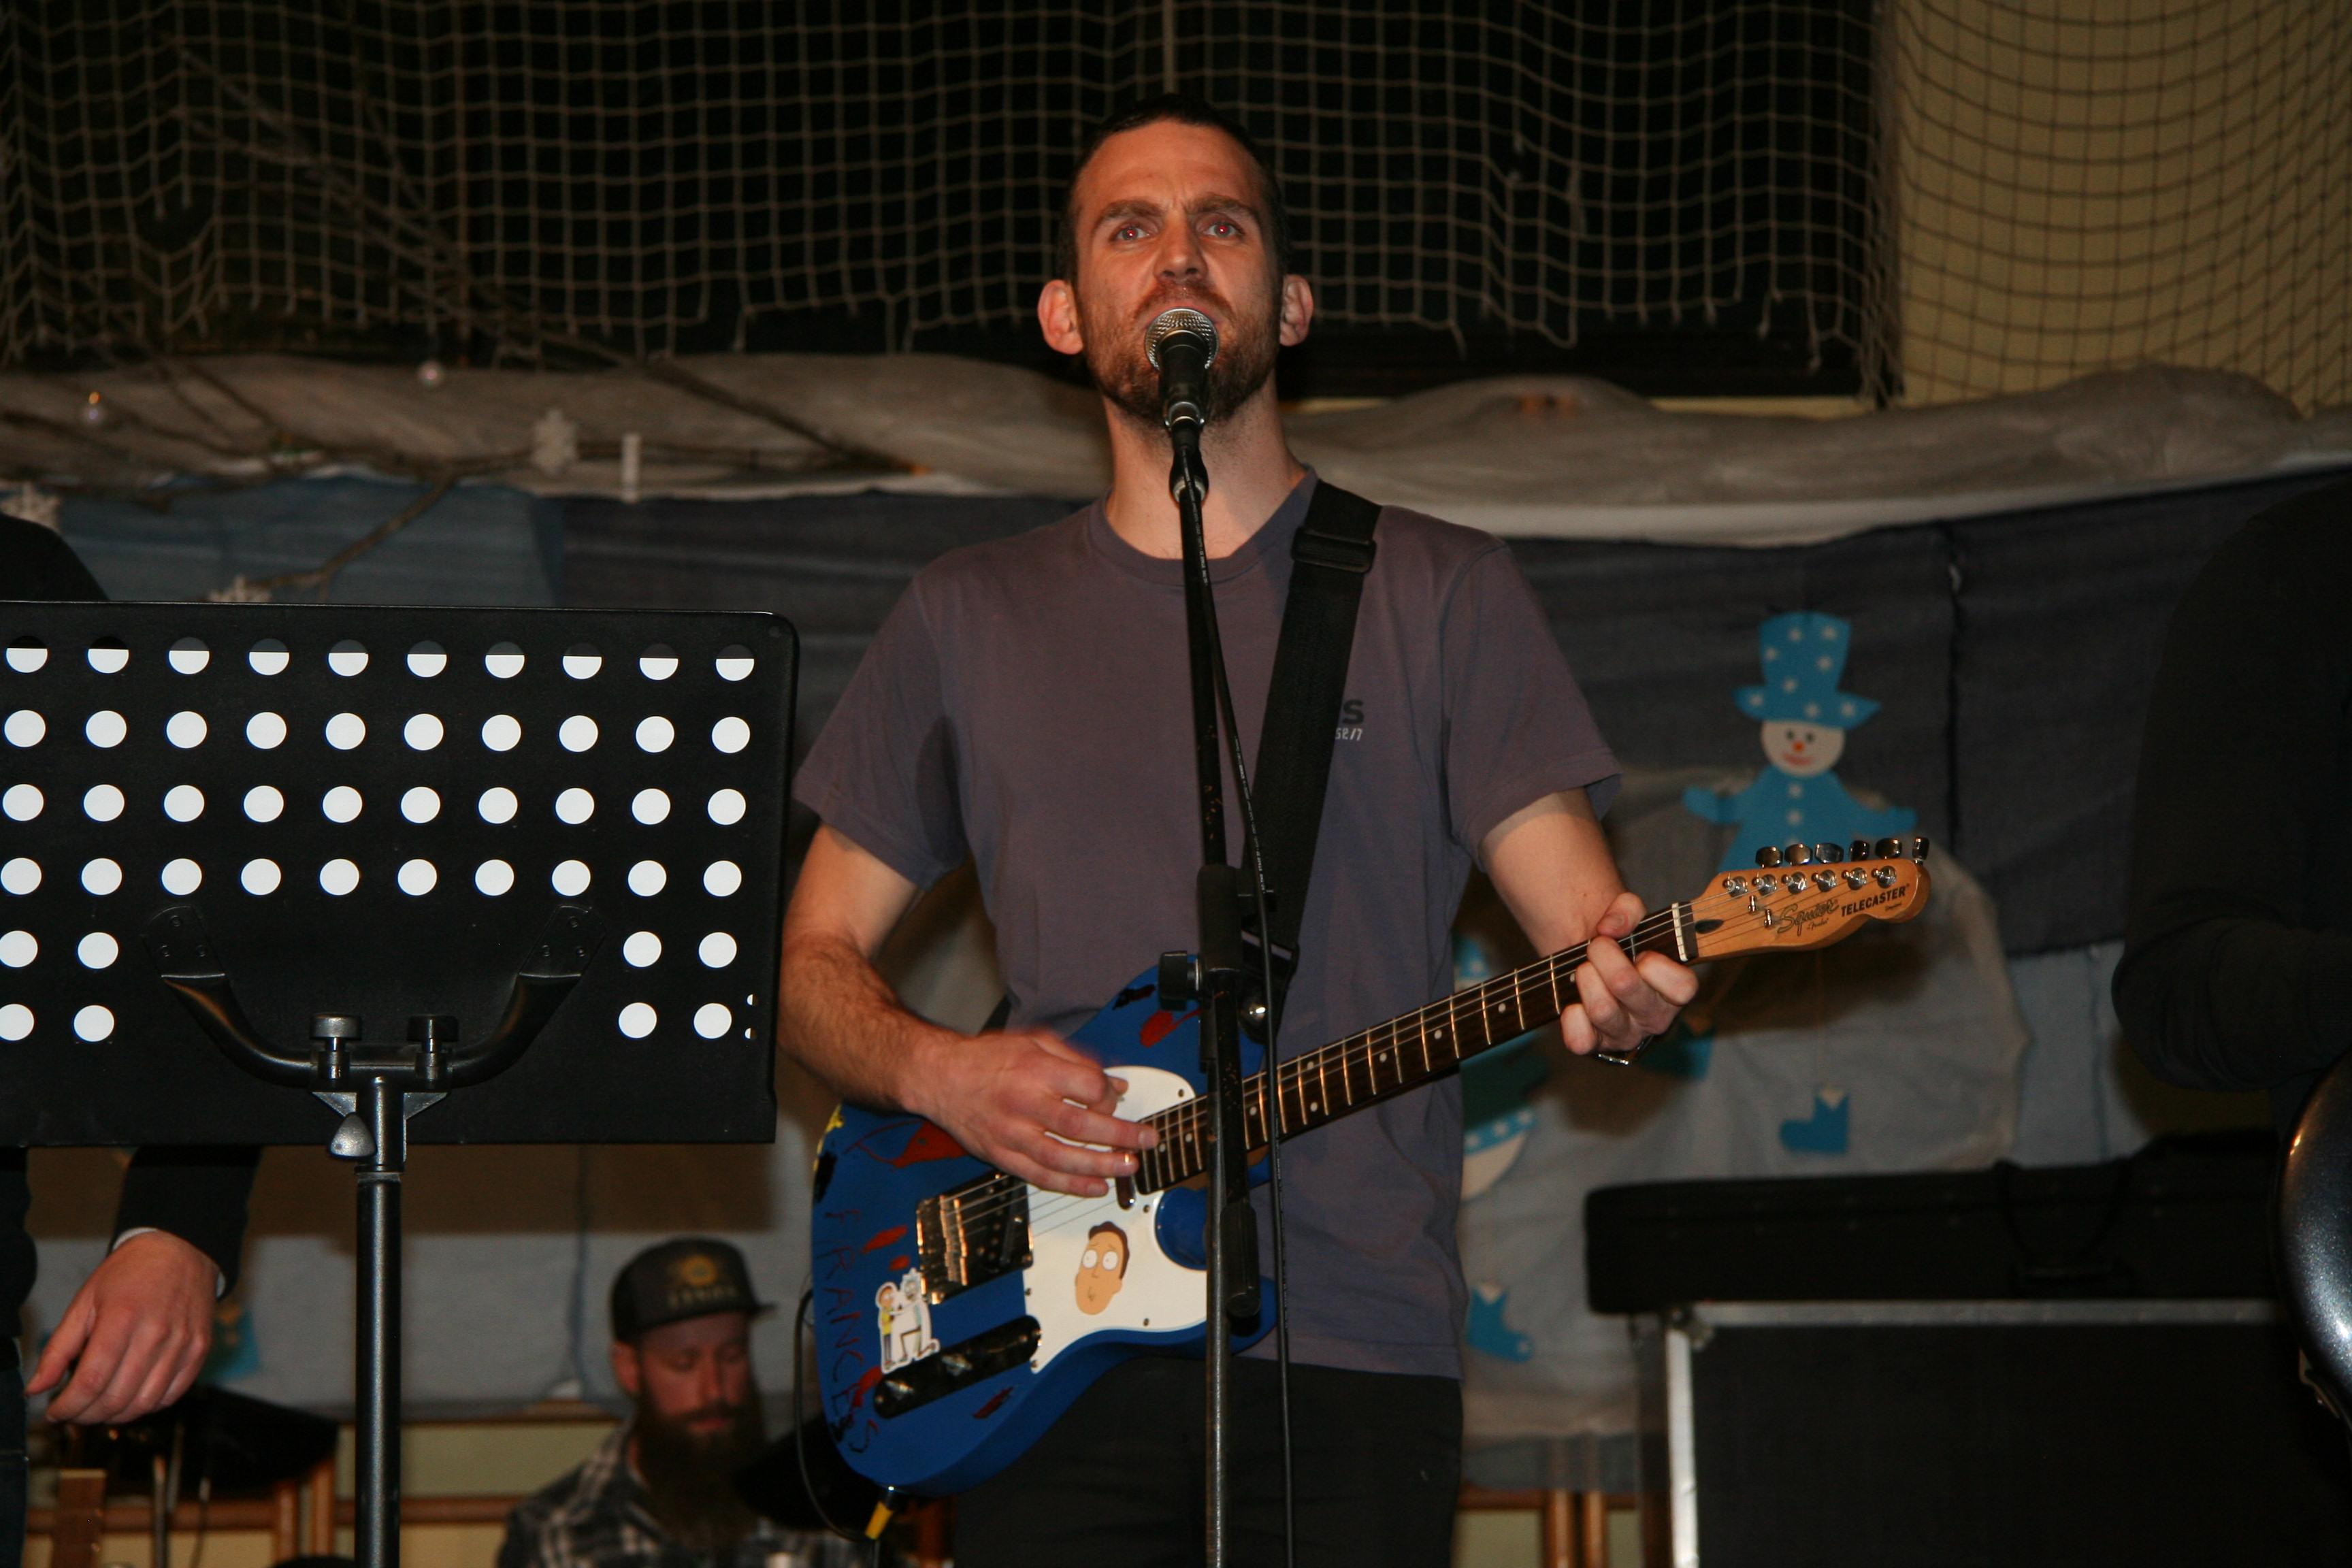 novoletno_humanitarni-koncert-2019-222